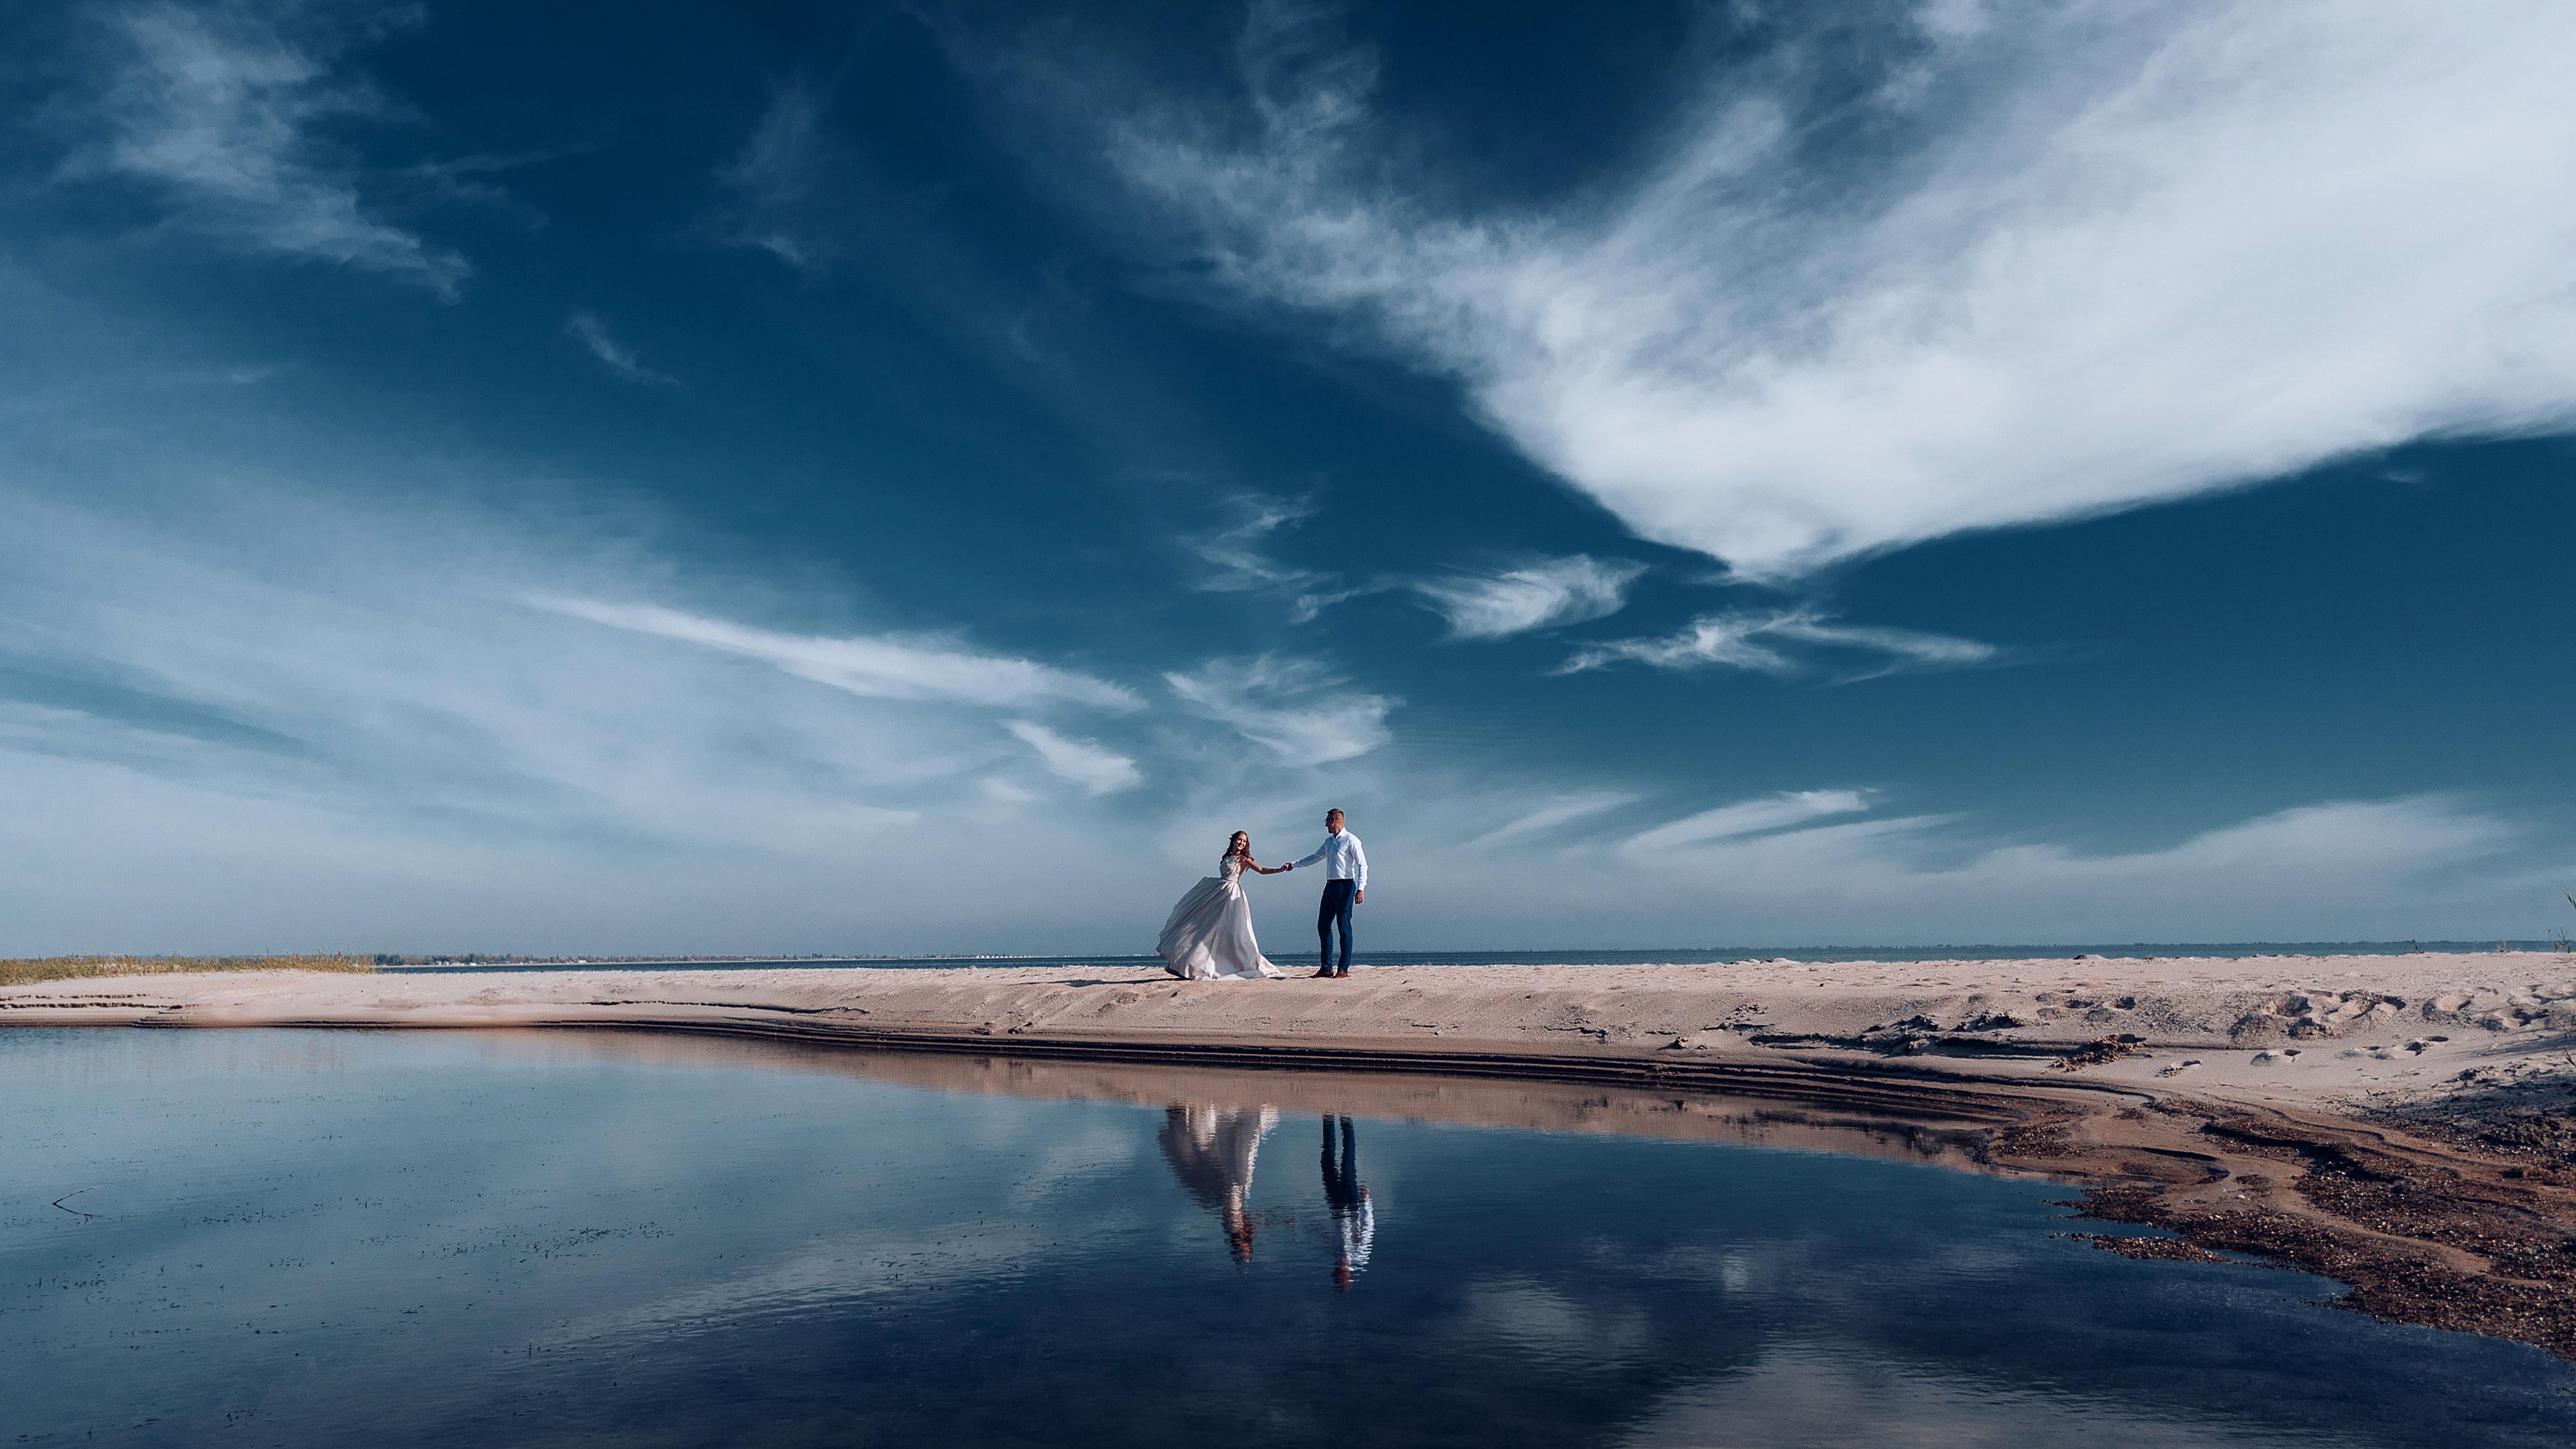 Contate Wedding Photographer Los Angeles in California, Ricardo Da Costa.